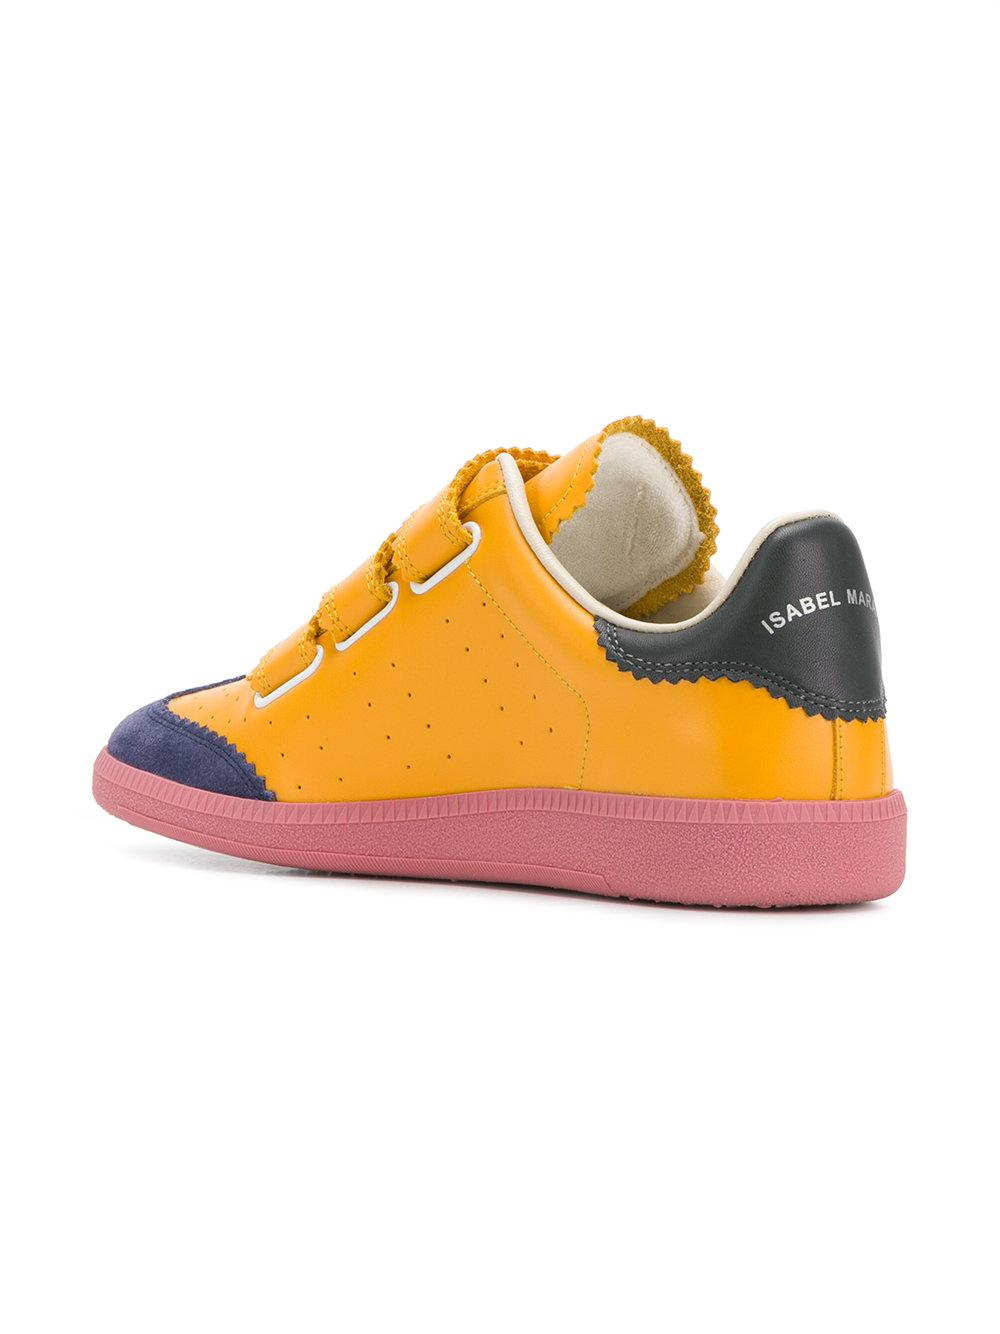 flat sole sneakers - Multicolour Isabel Marant VkbCC